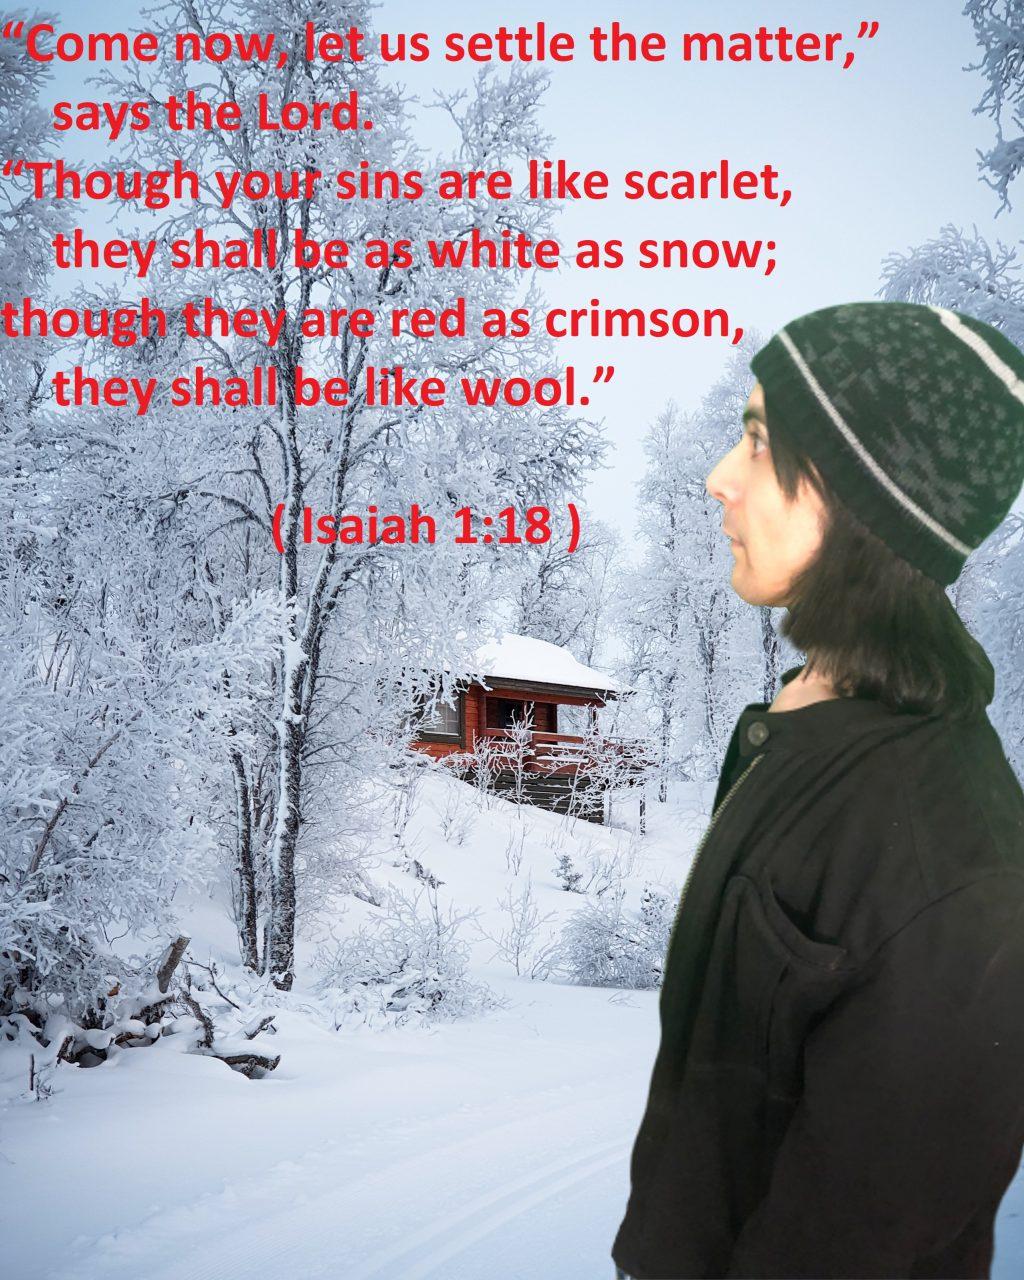 Motivational Bible verse on edited winter photo